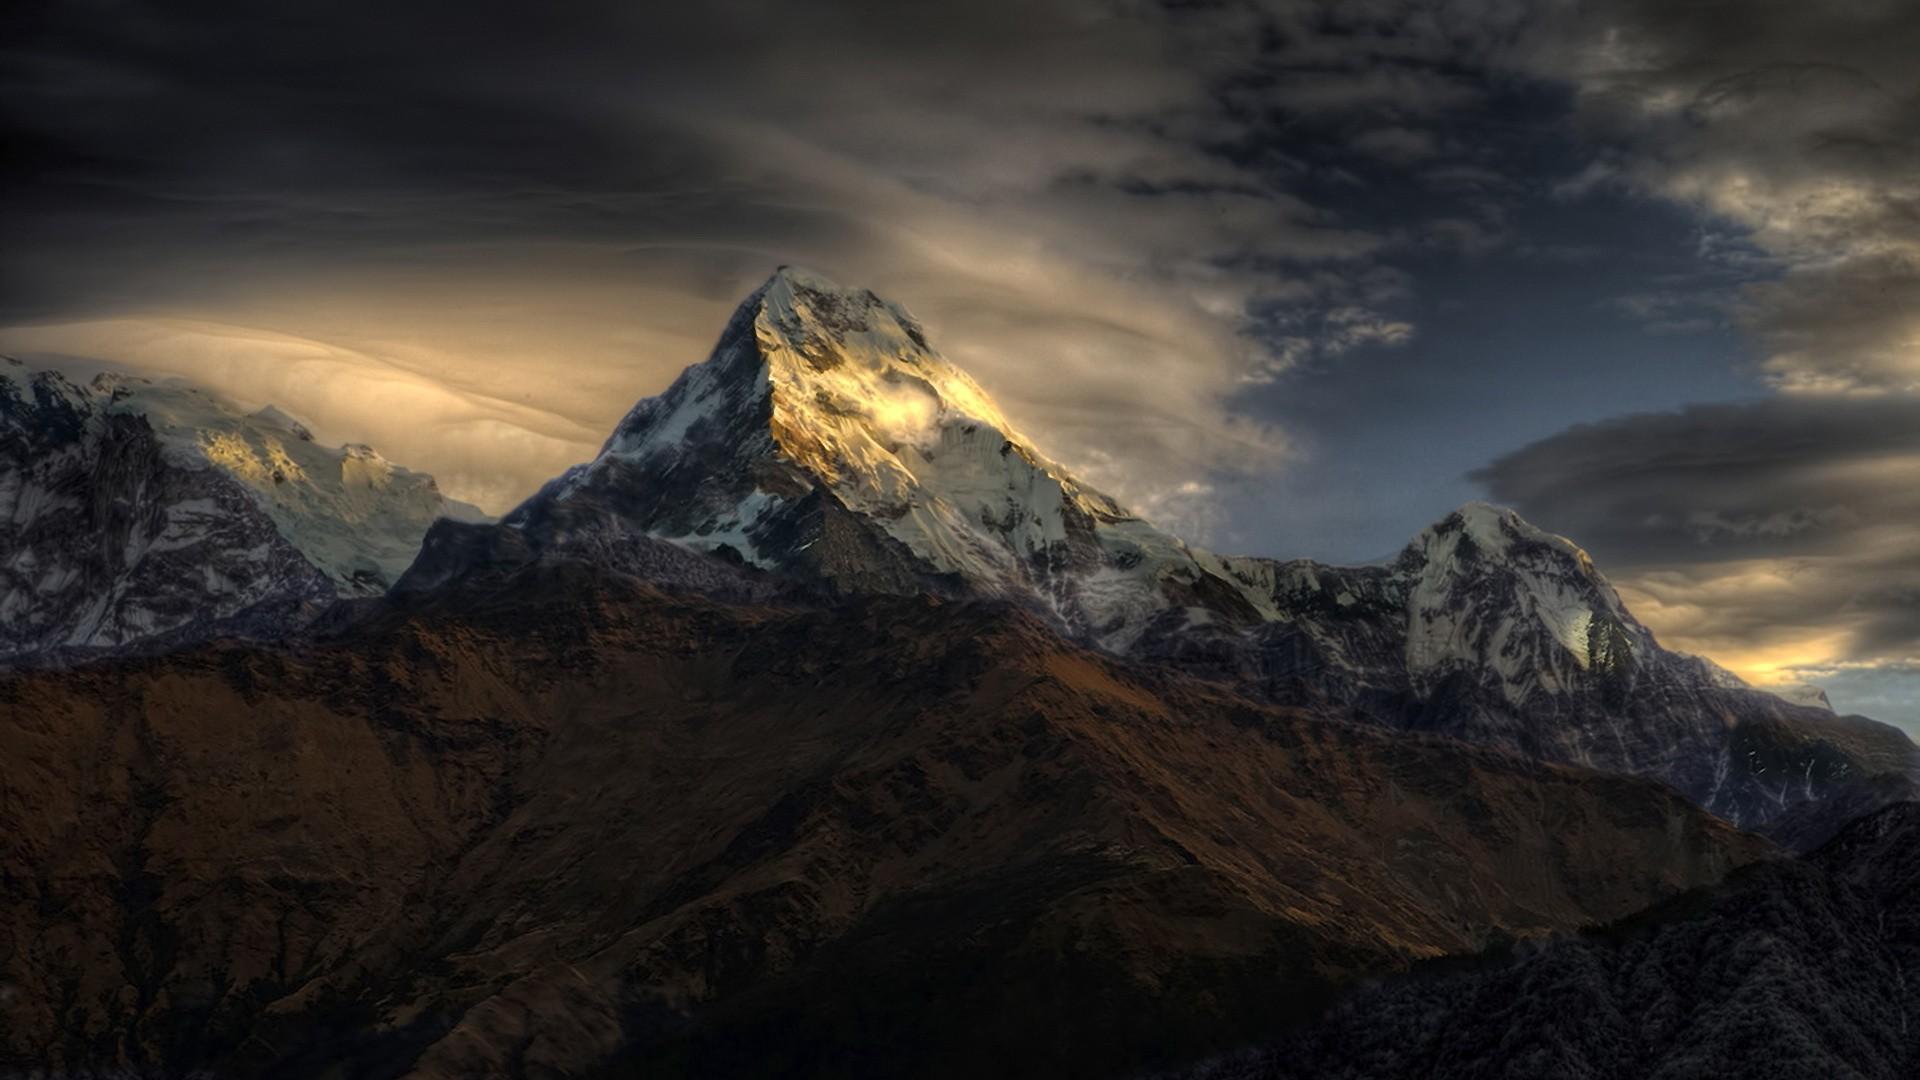 Top Wallpaper Mountain Grey - 413603  You Should Have_136882.jpg